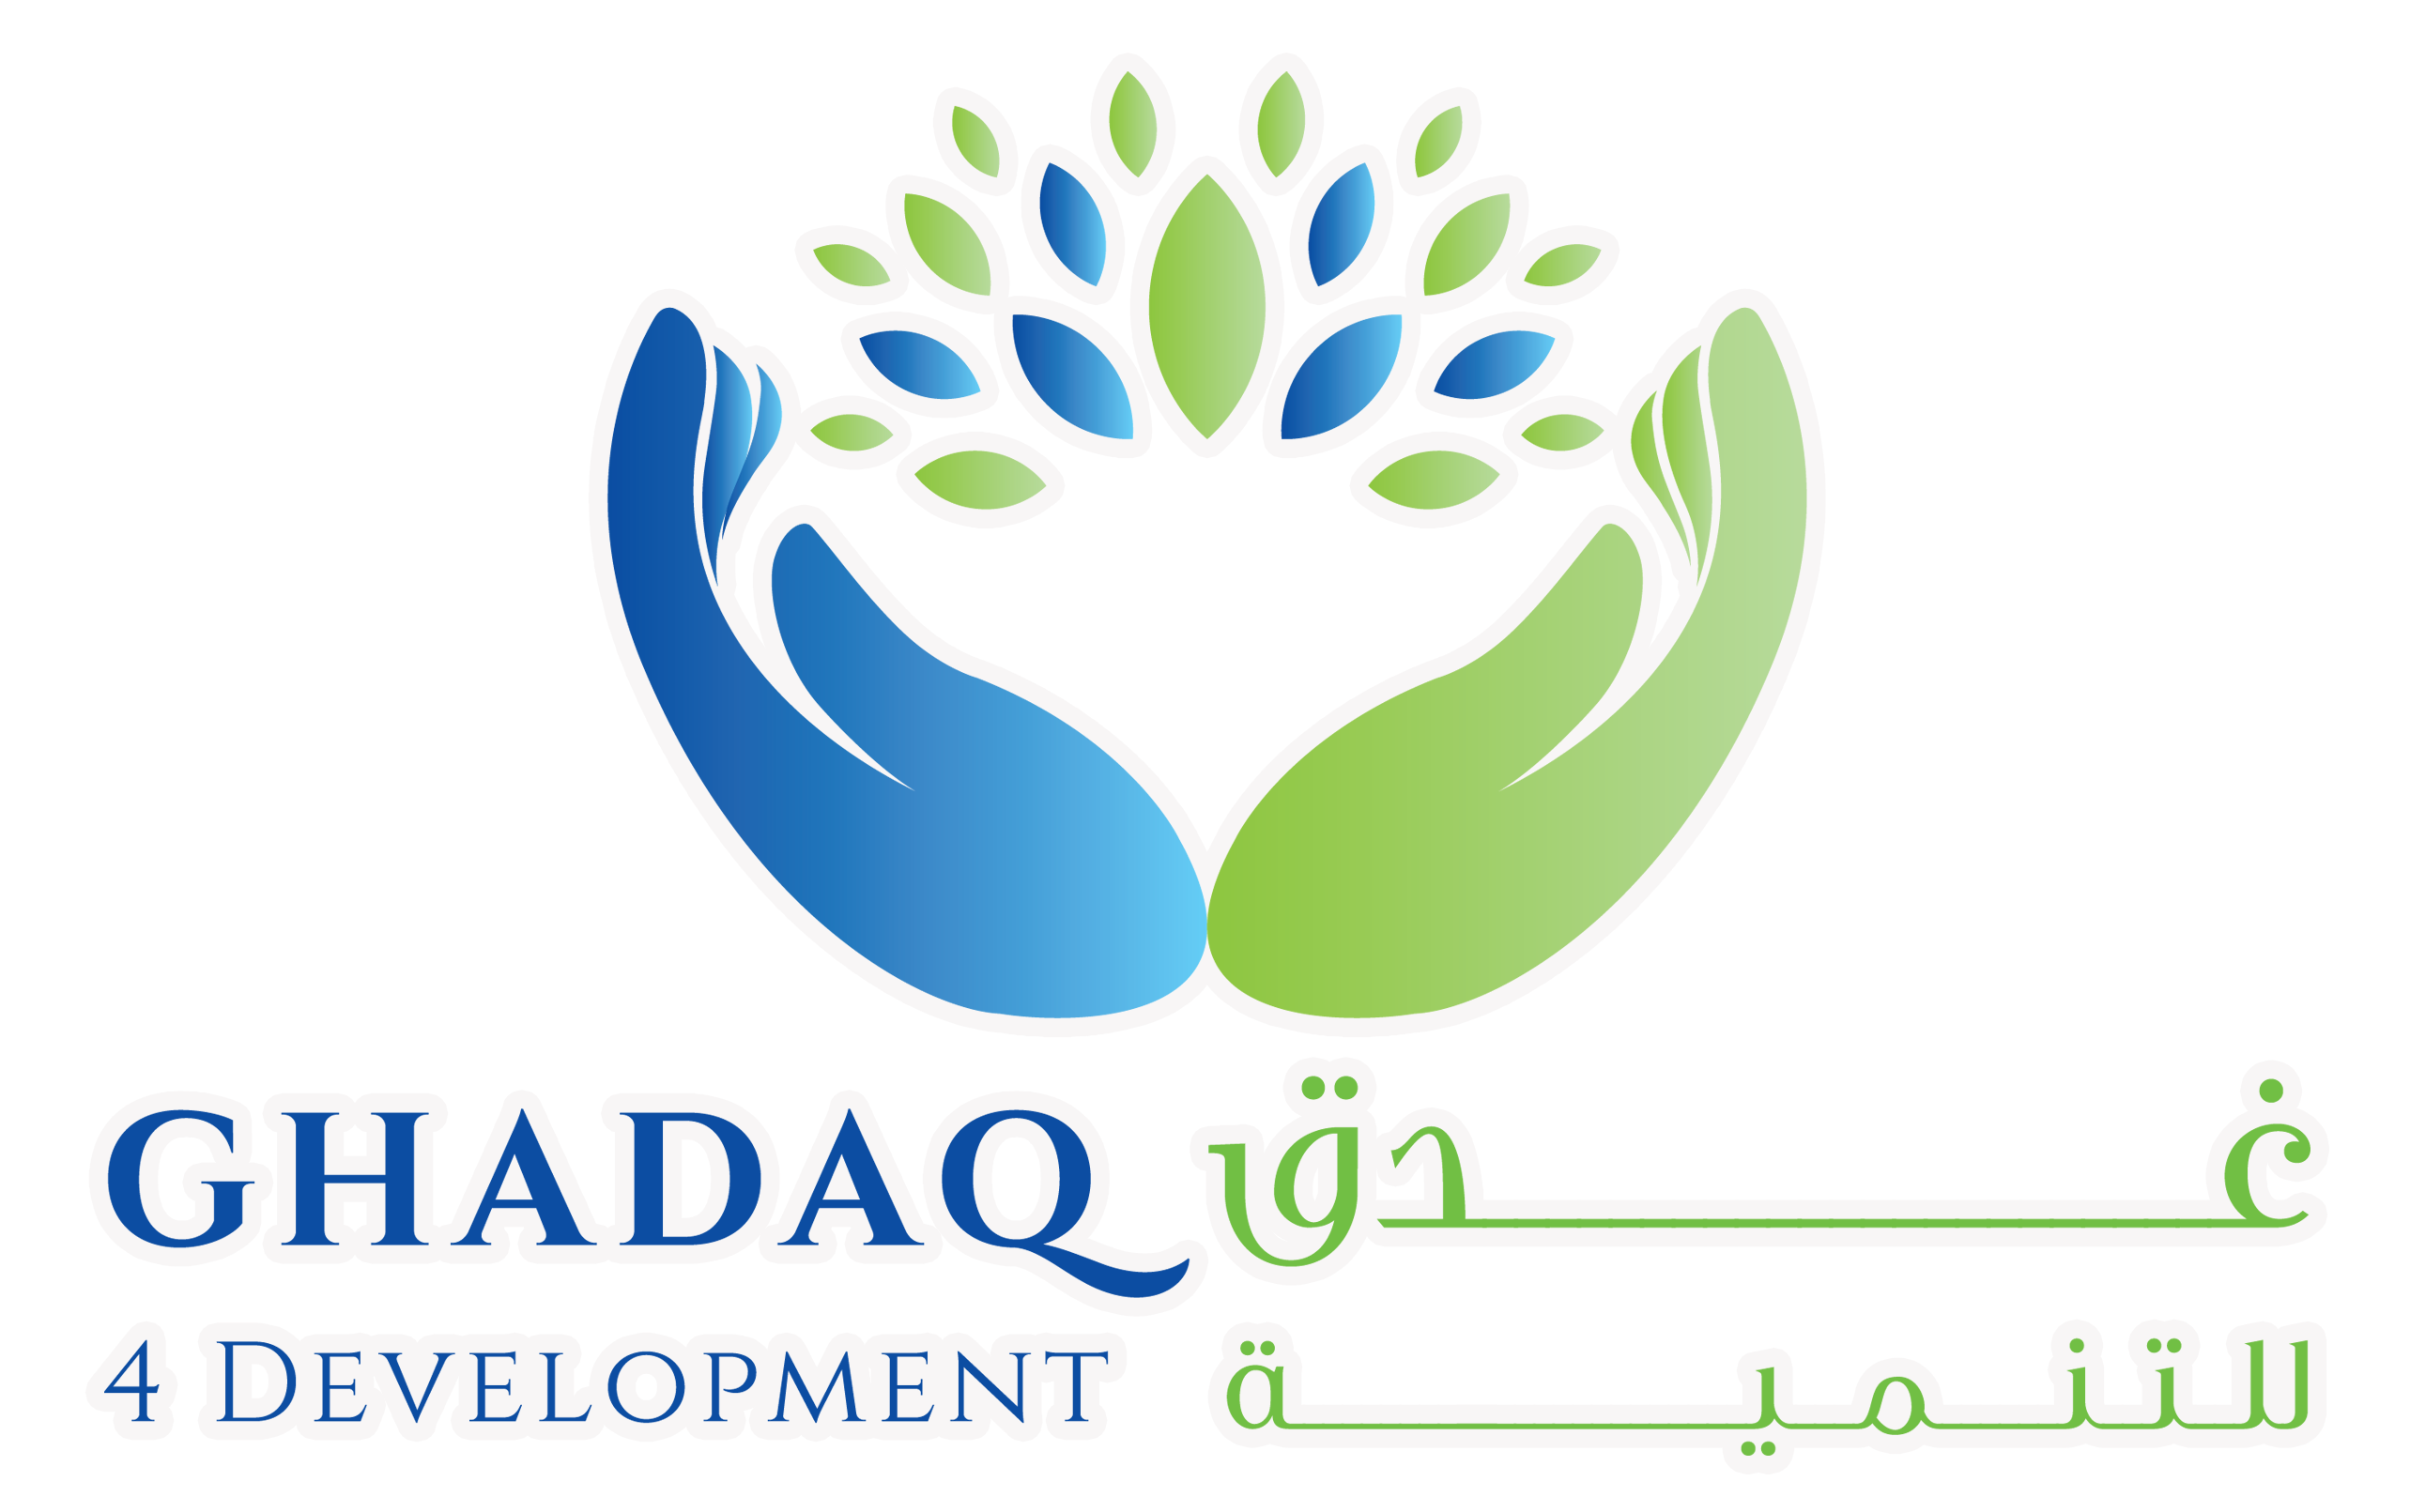 GHADAQ FOR DEVELOPMENT